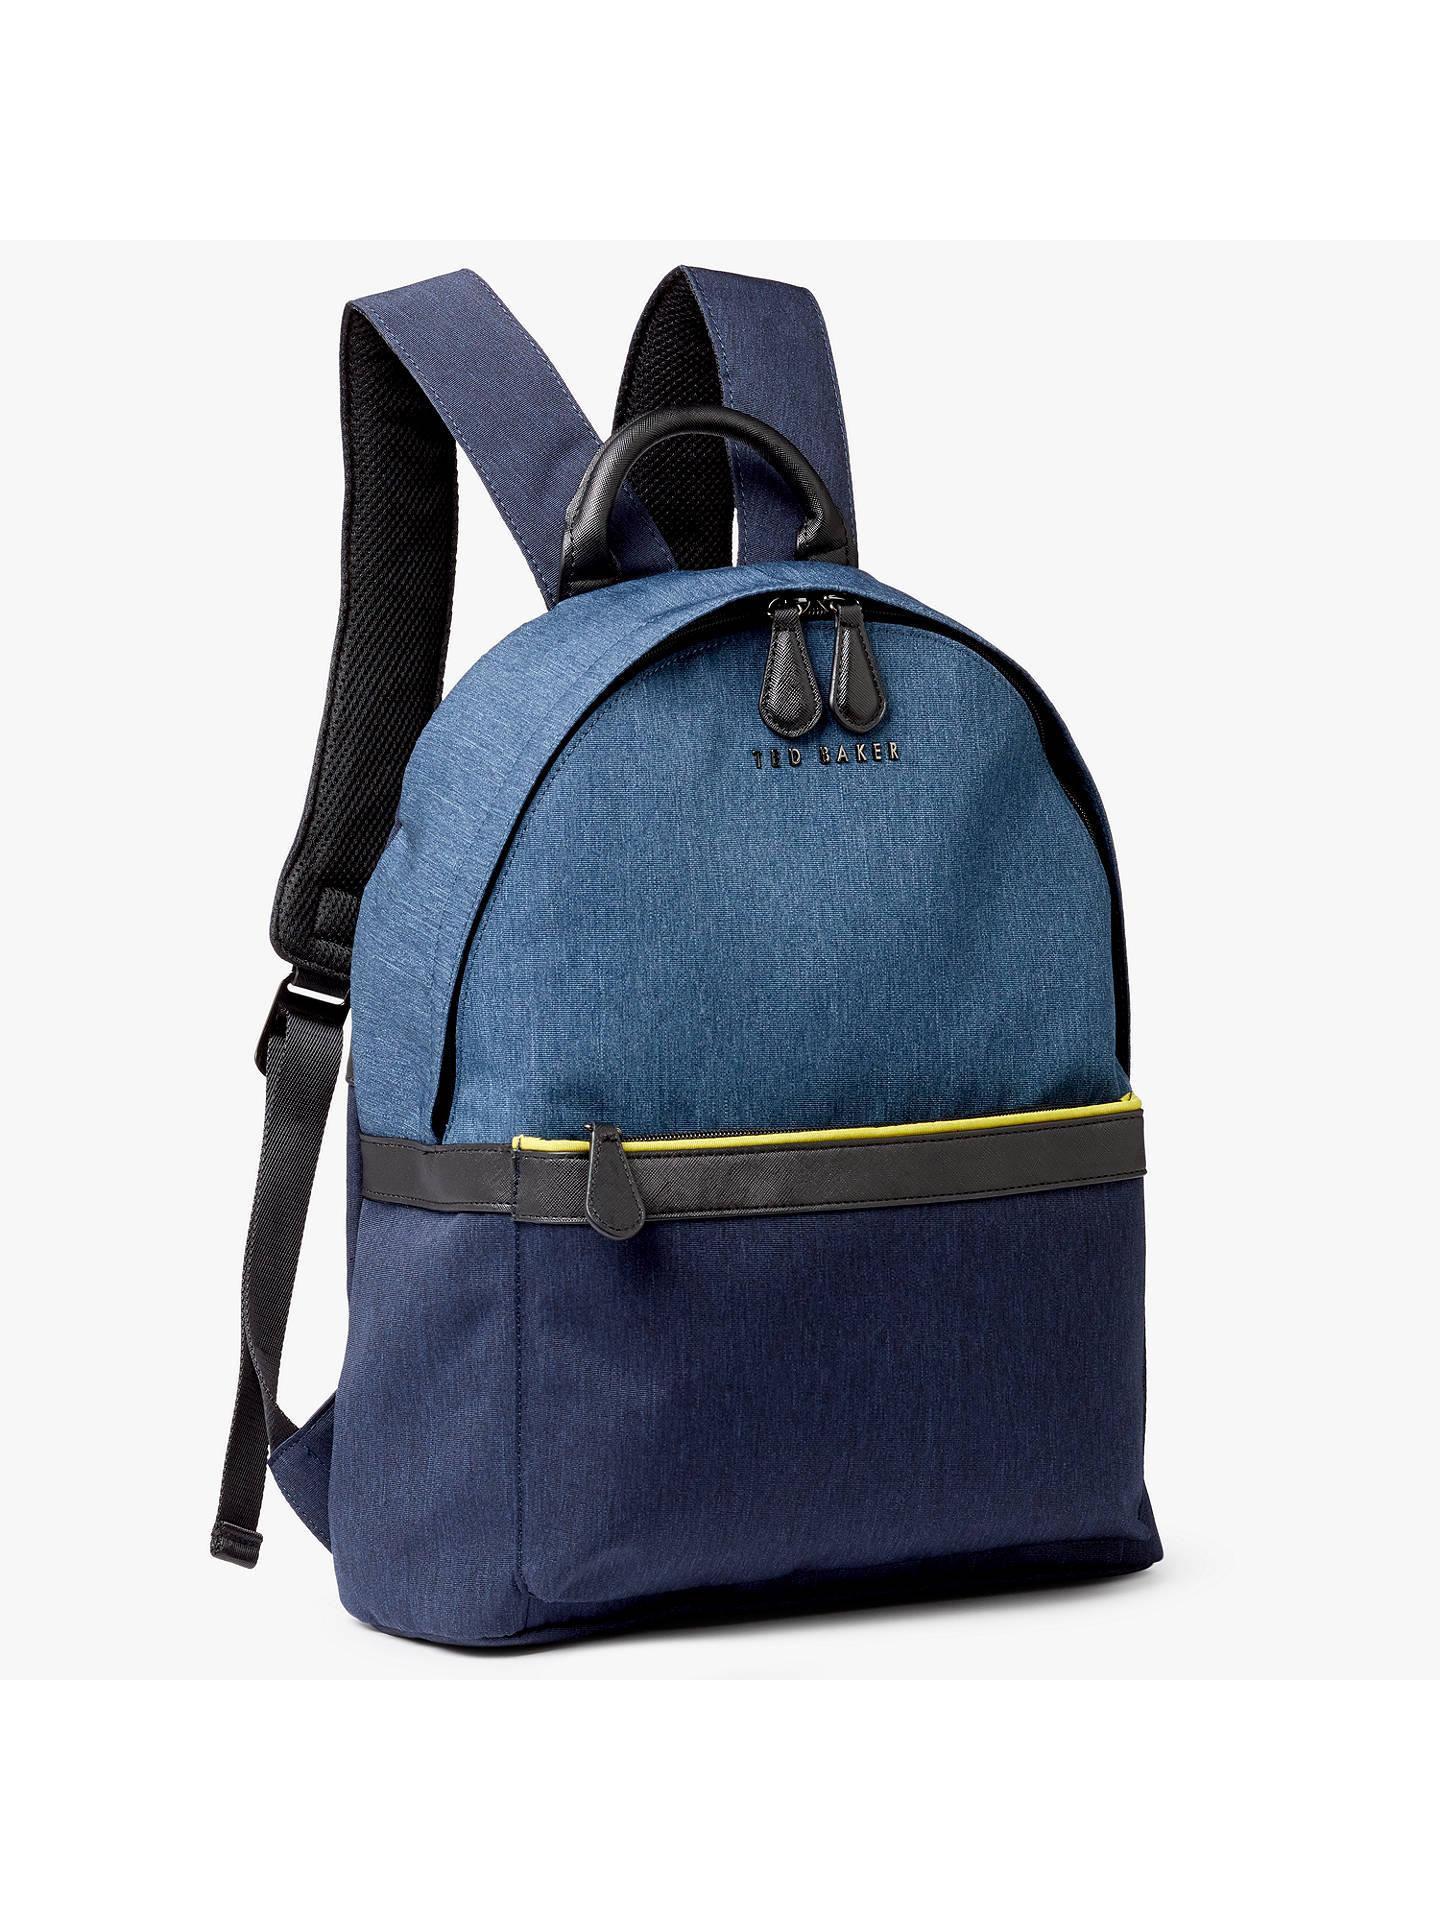 971d5b2ebe Ted Baker Zirabi Contrast Trim Backpack at John Lewis & Partners